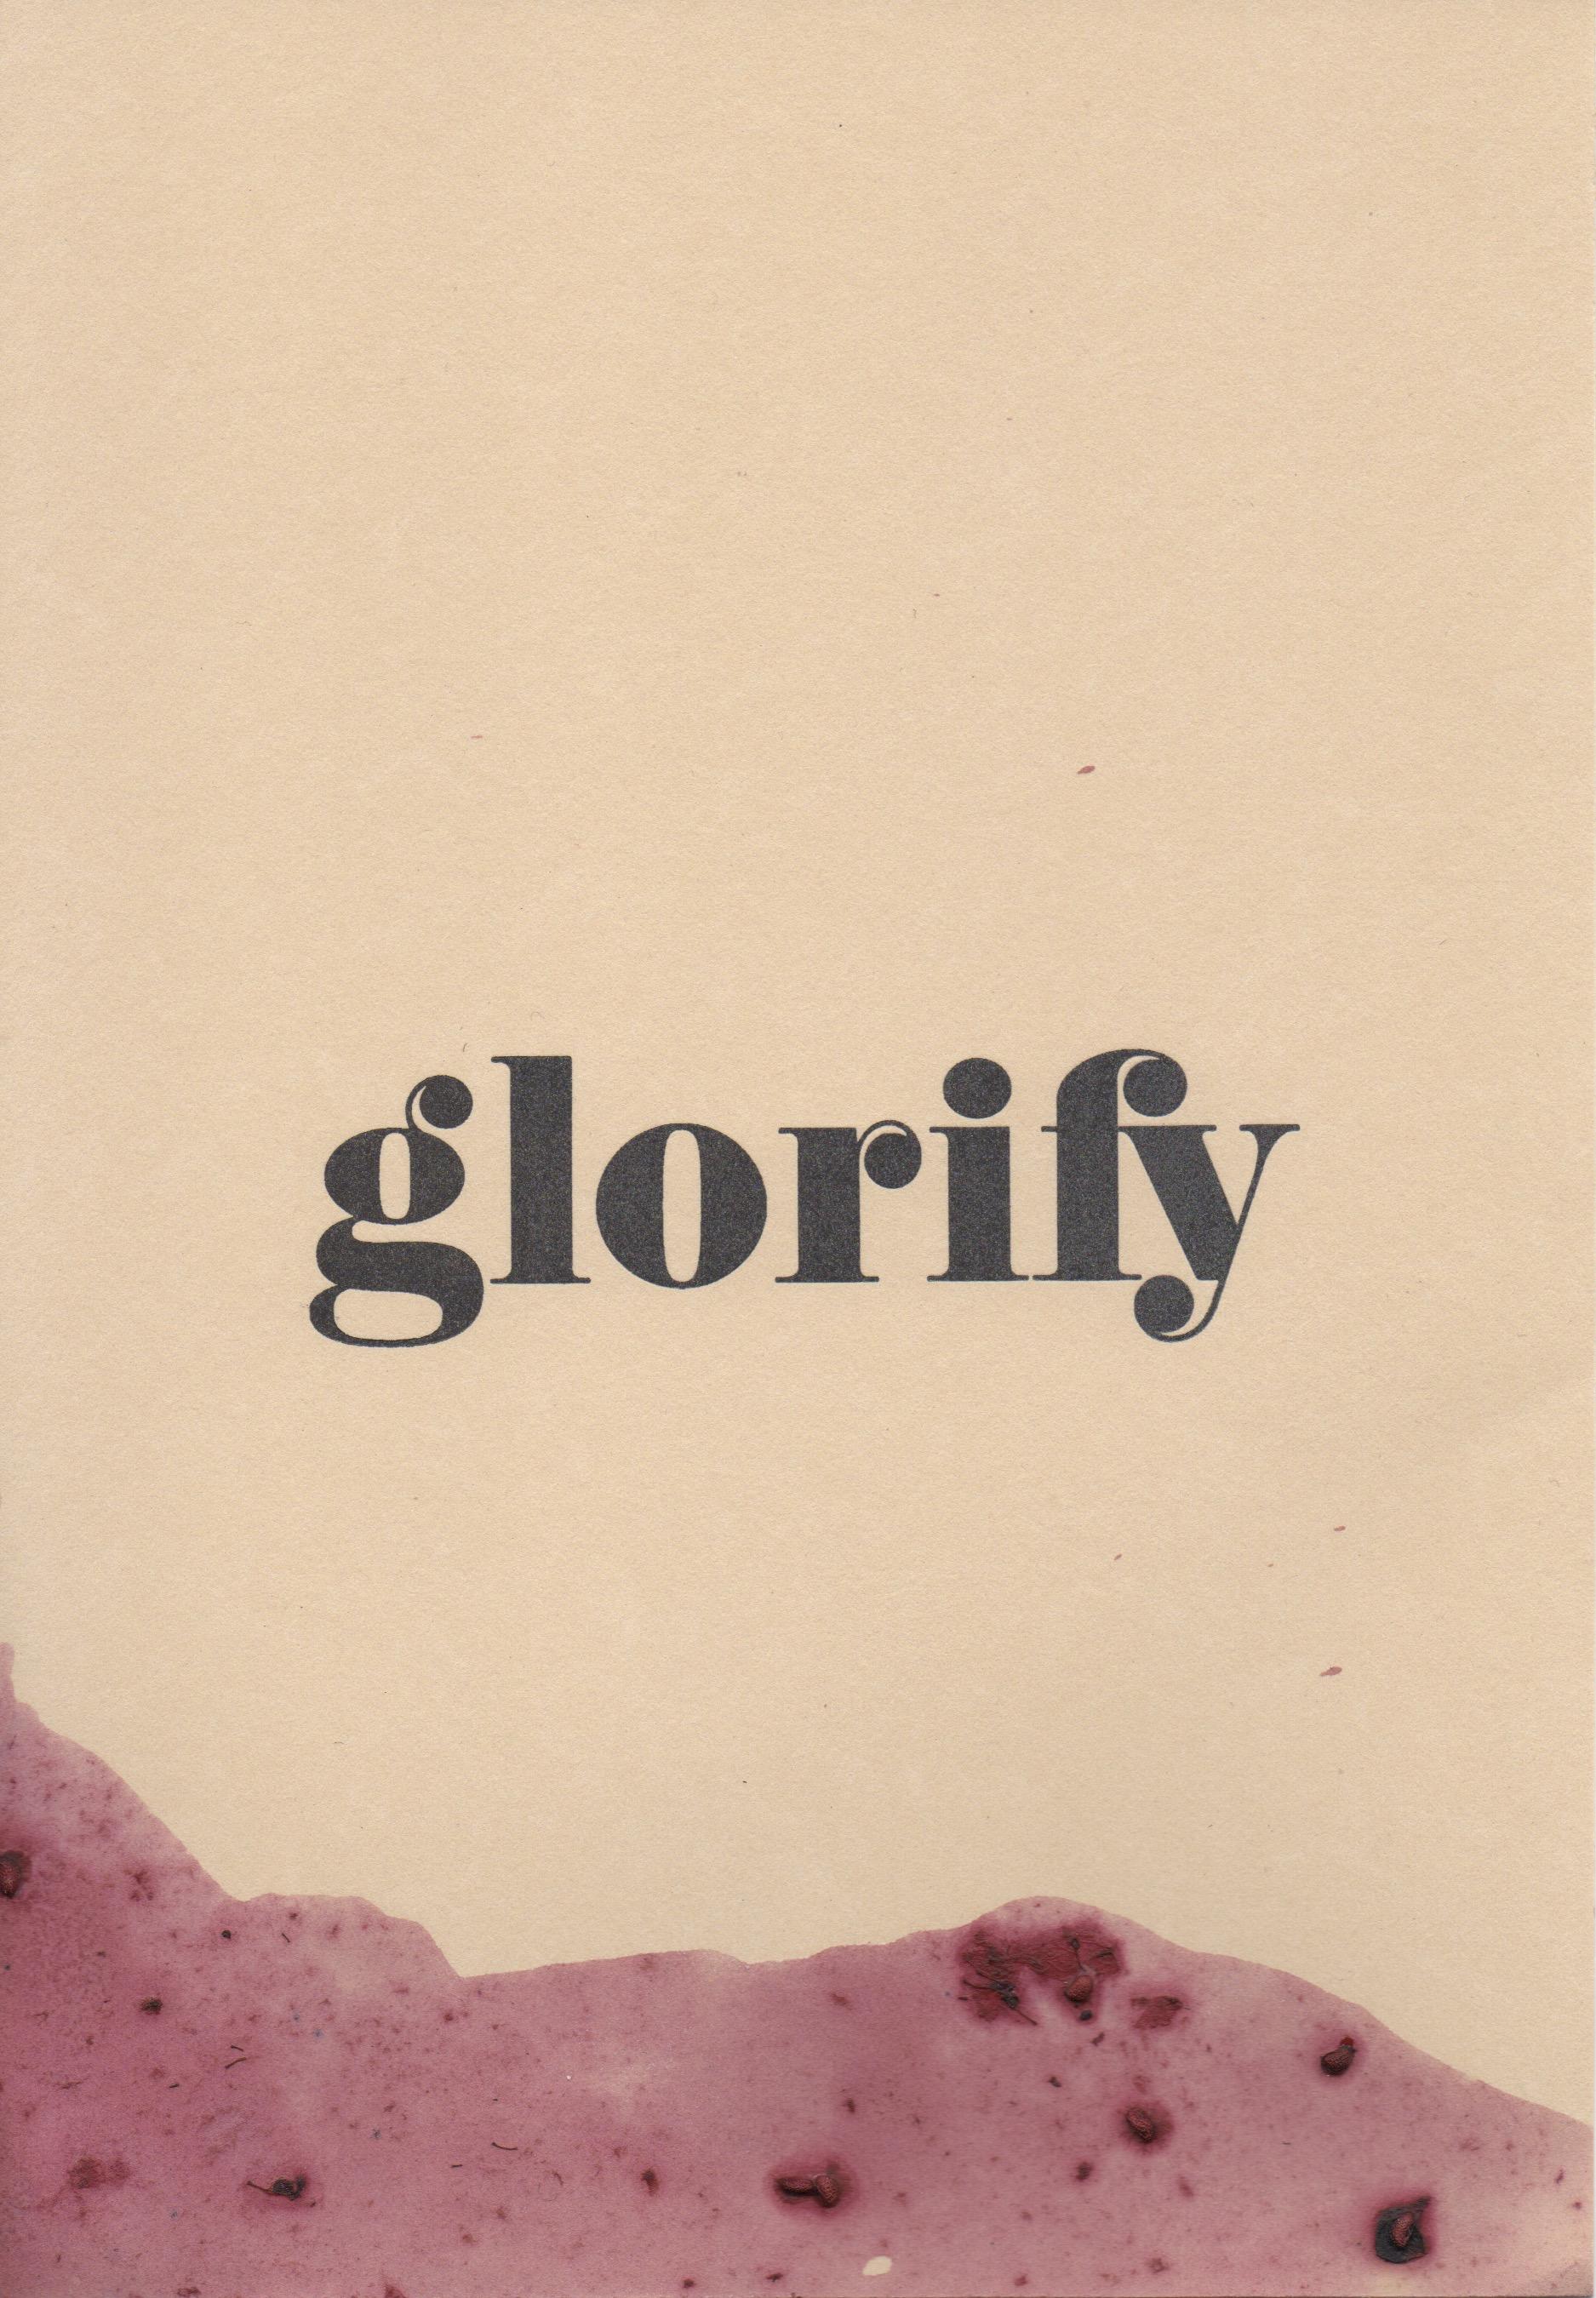 Glorify_01.jpeg